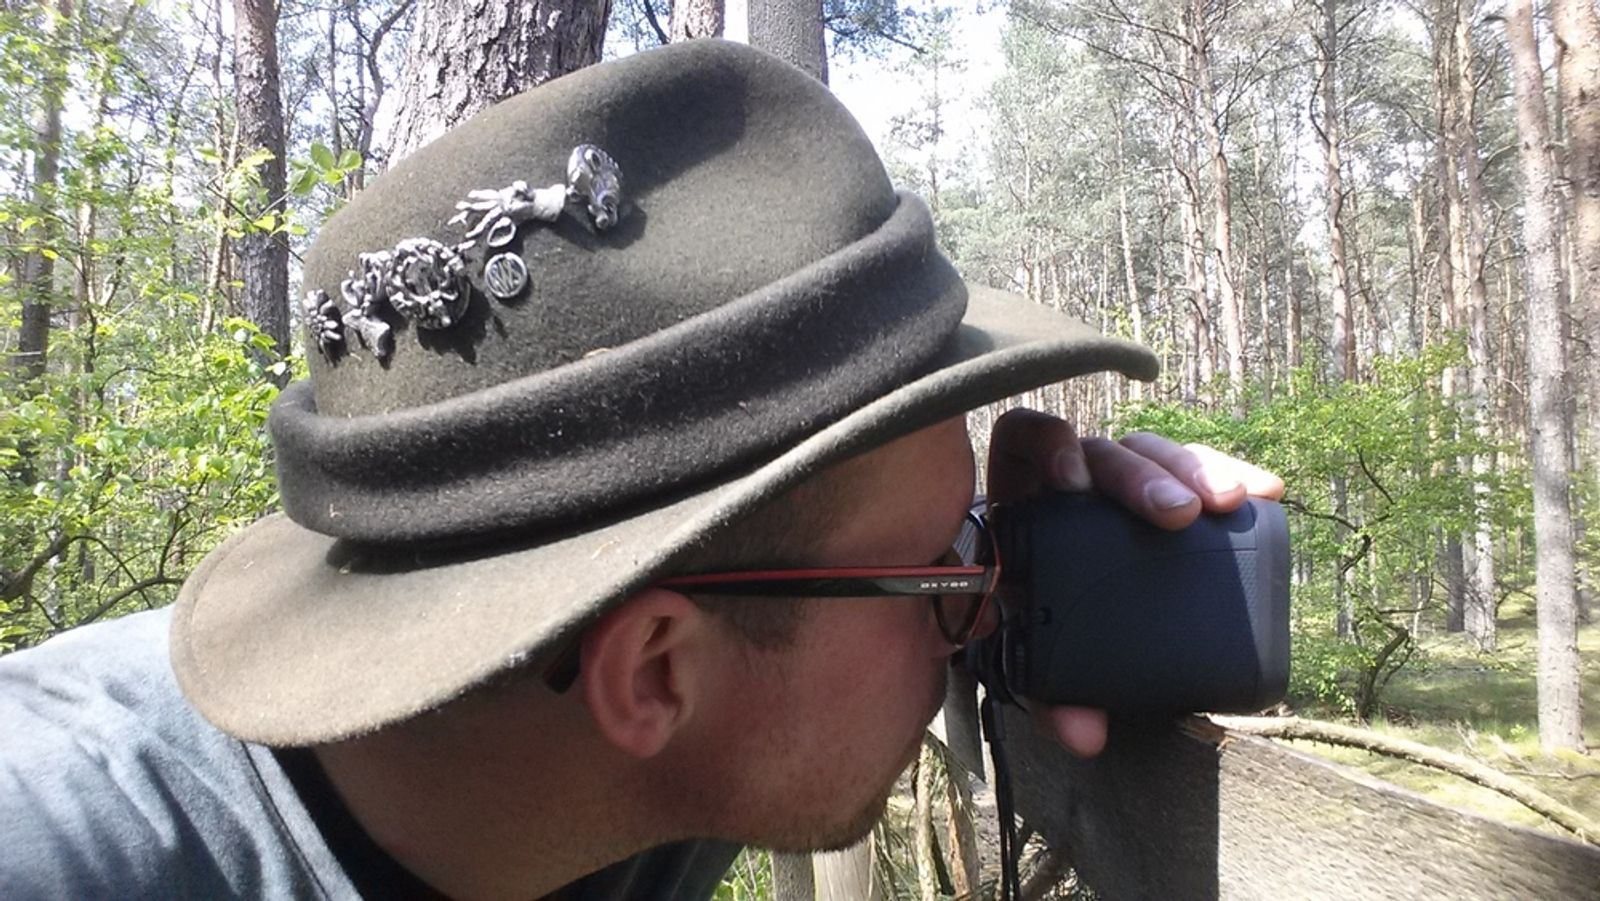 Nikon Laser Entfernungsmesser Aculon : Laser entfernungsmesser aculon al